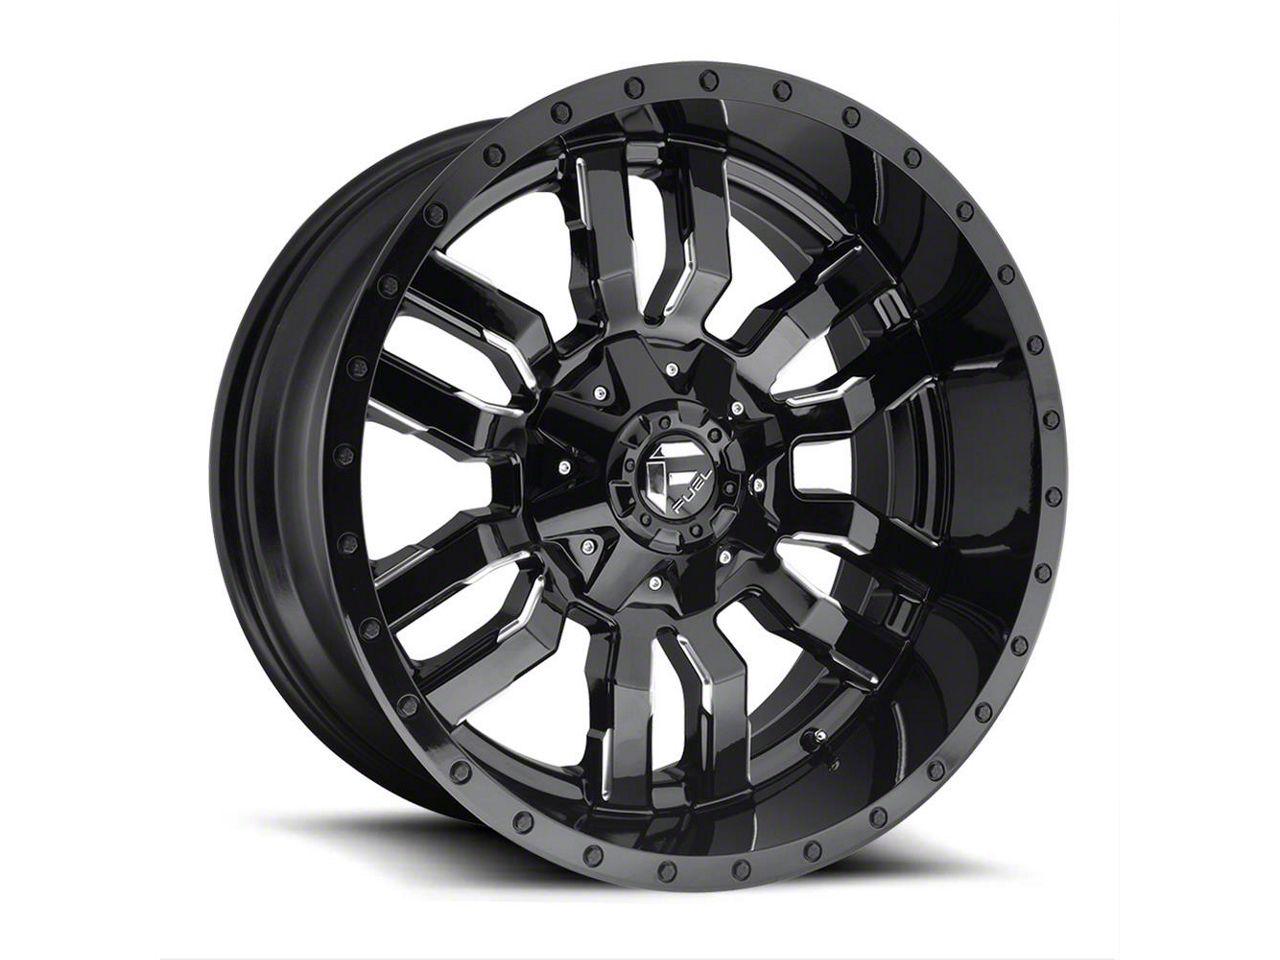 Fuel Wheels Sledge Gloss Black Milled 6-Lug Wheel - 22x12 (04-18 F-150)